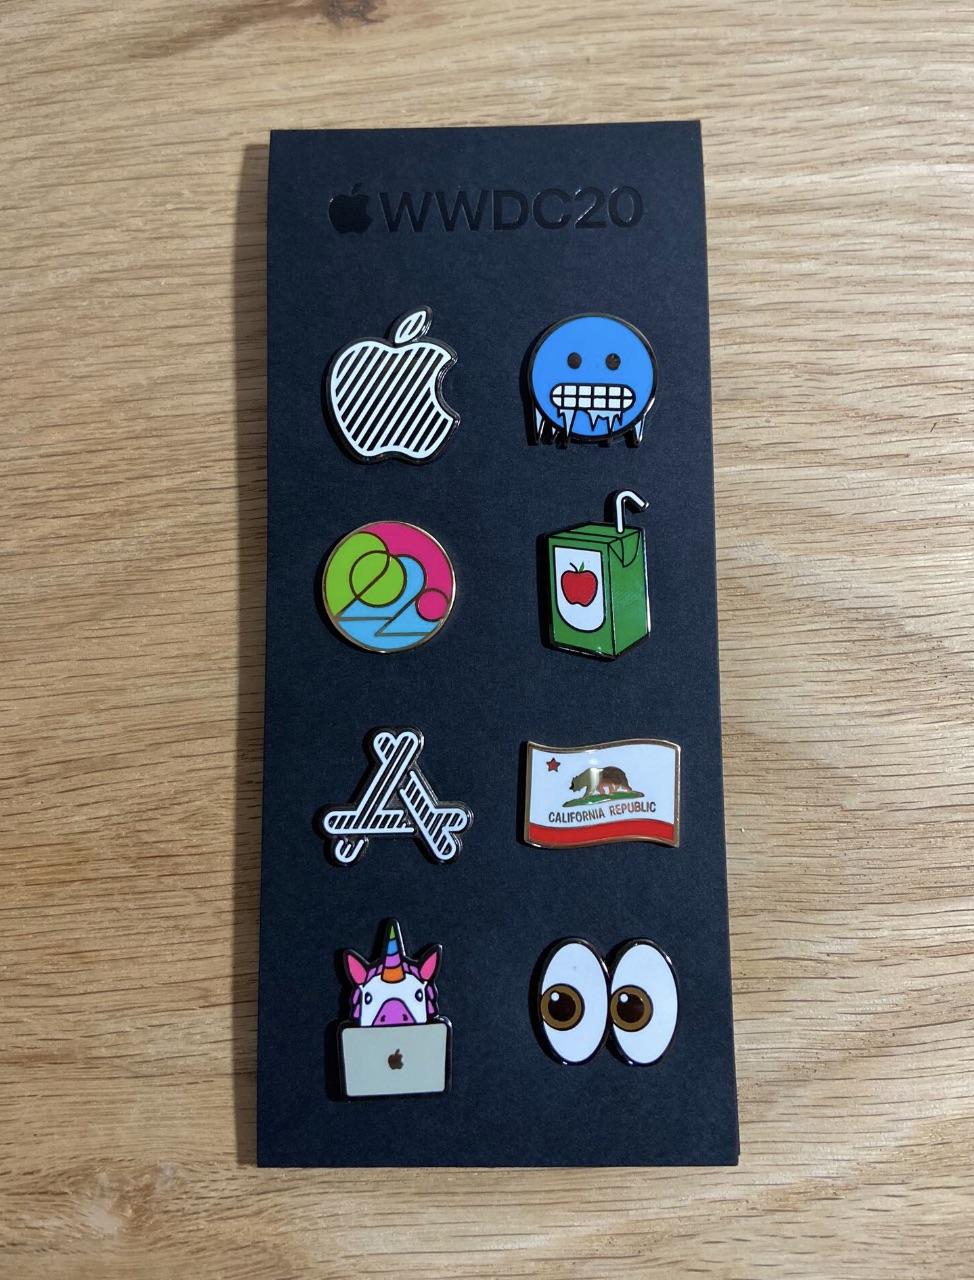 WWDC 2020 周边欣赏: 夹克与胸针